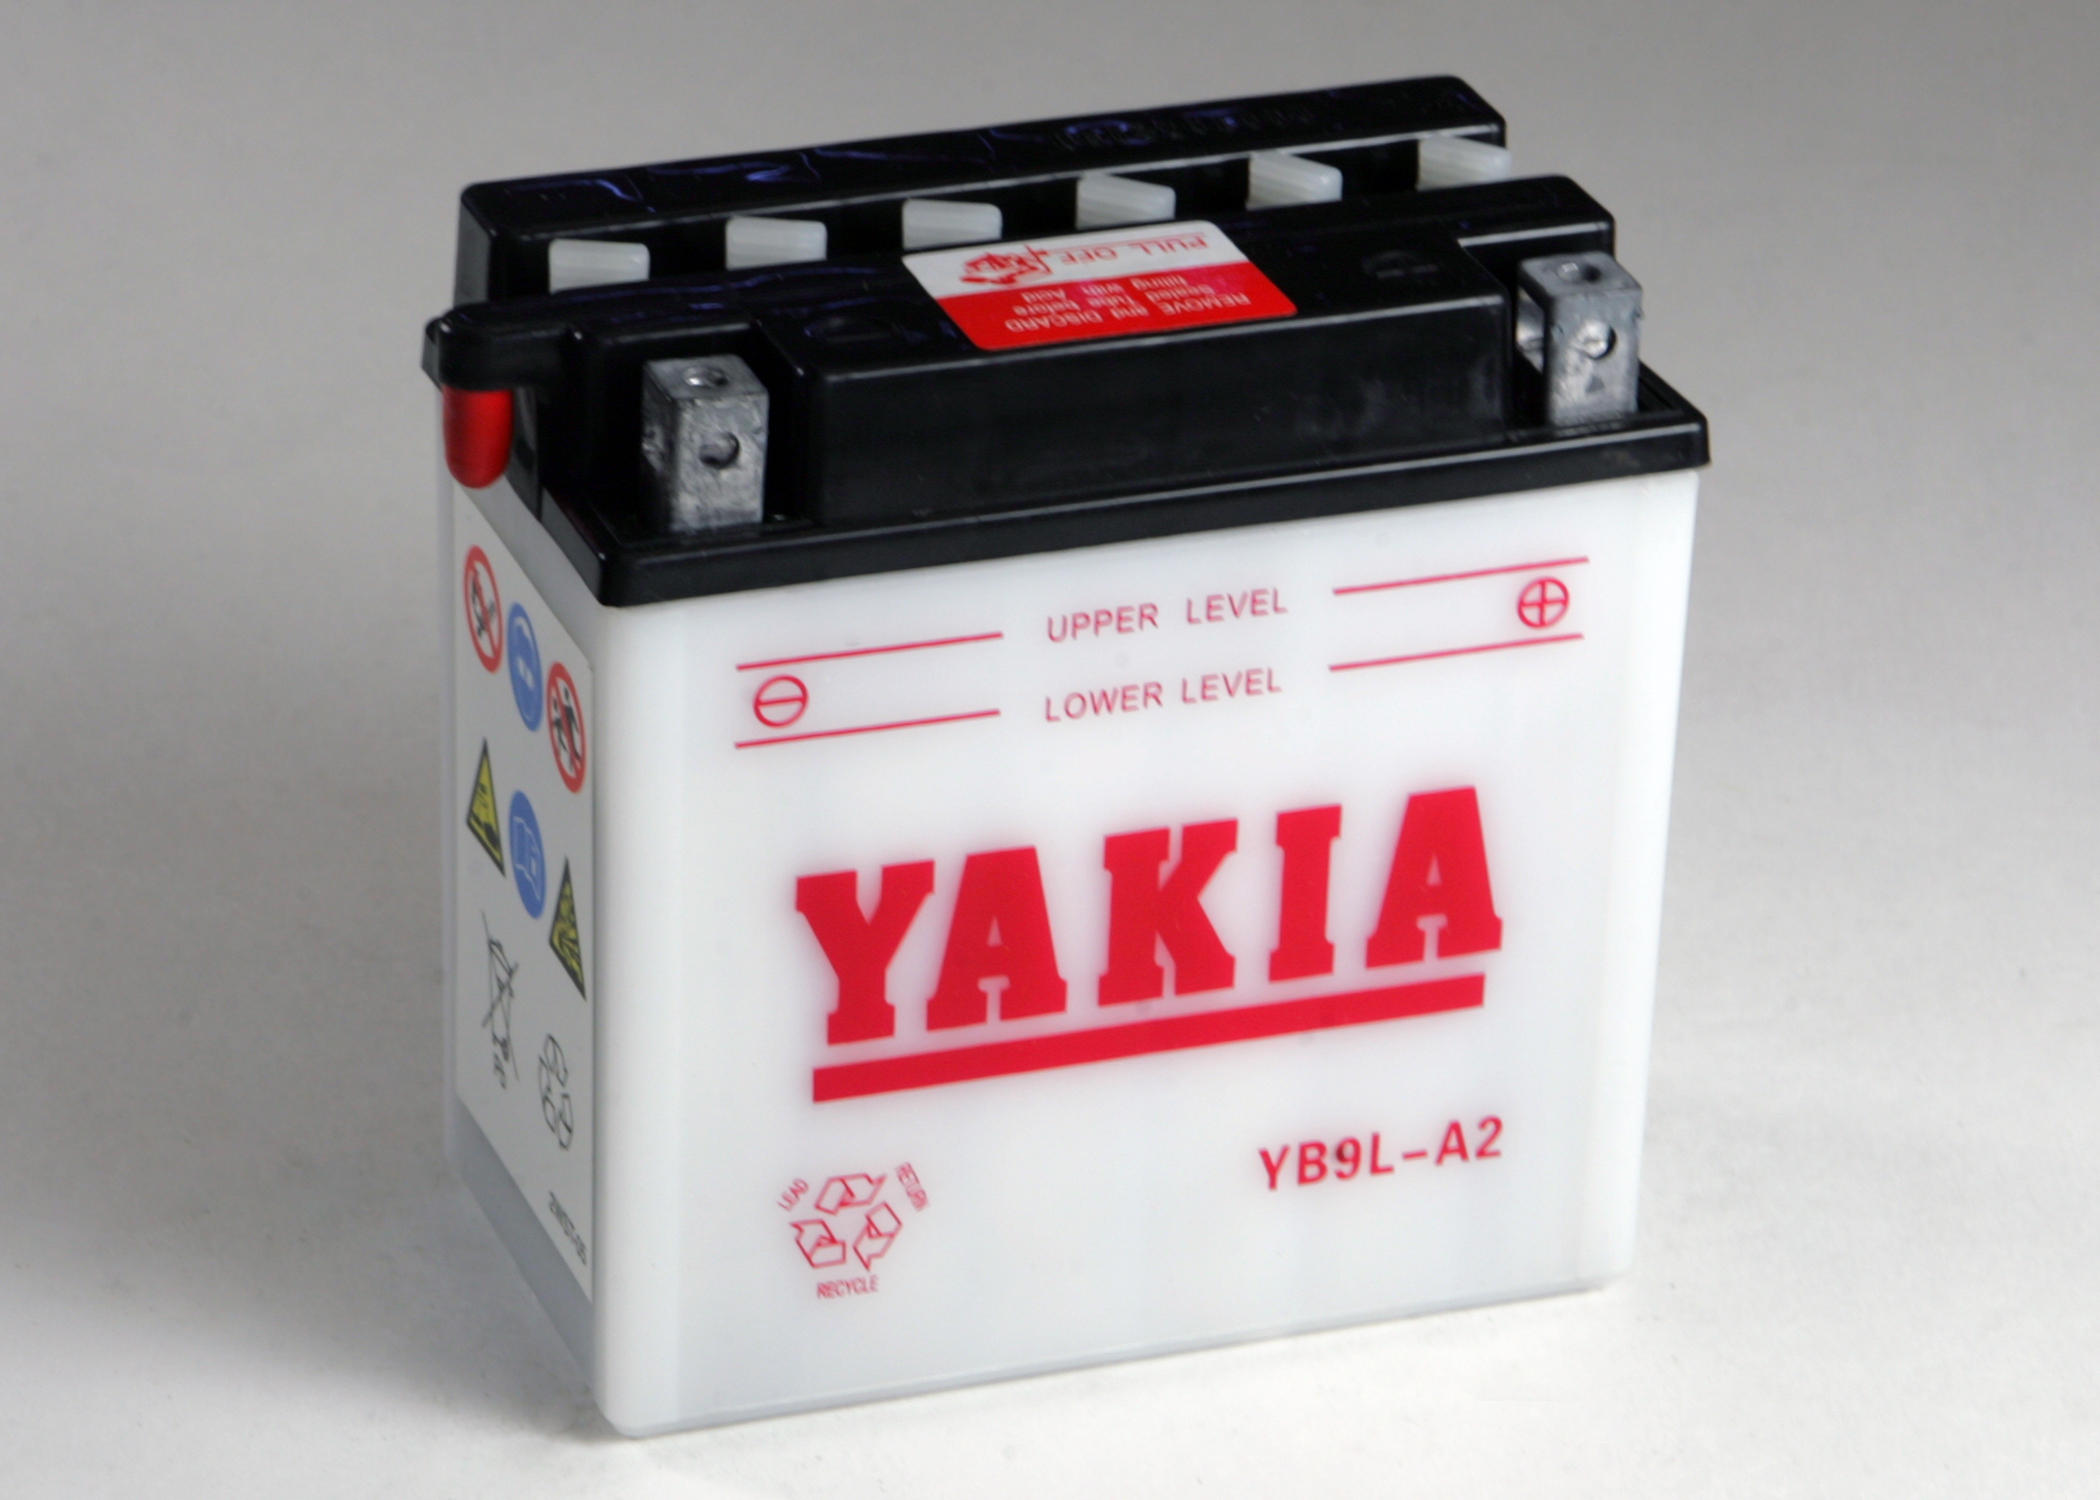 Battery for yamaha cs3b yamaha motorcycle batteries for Yamaha motorcycle batteries